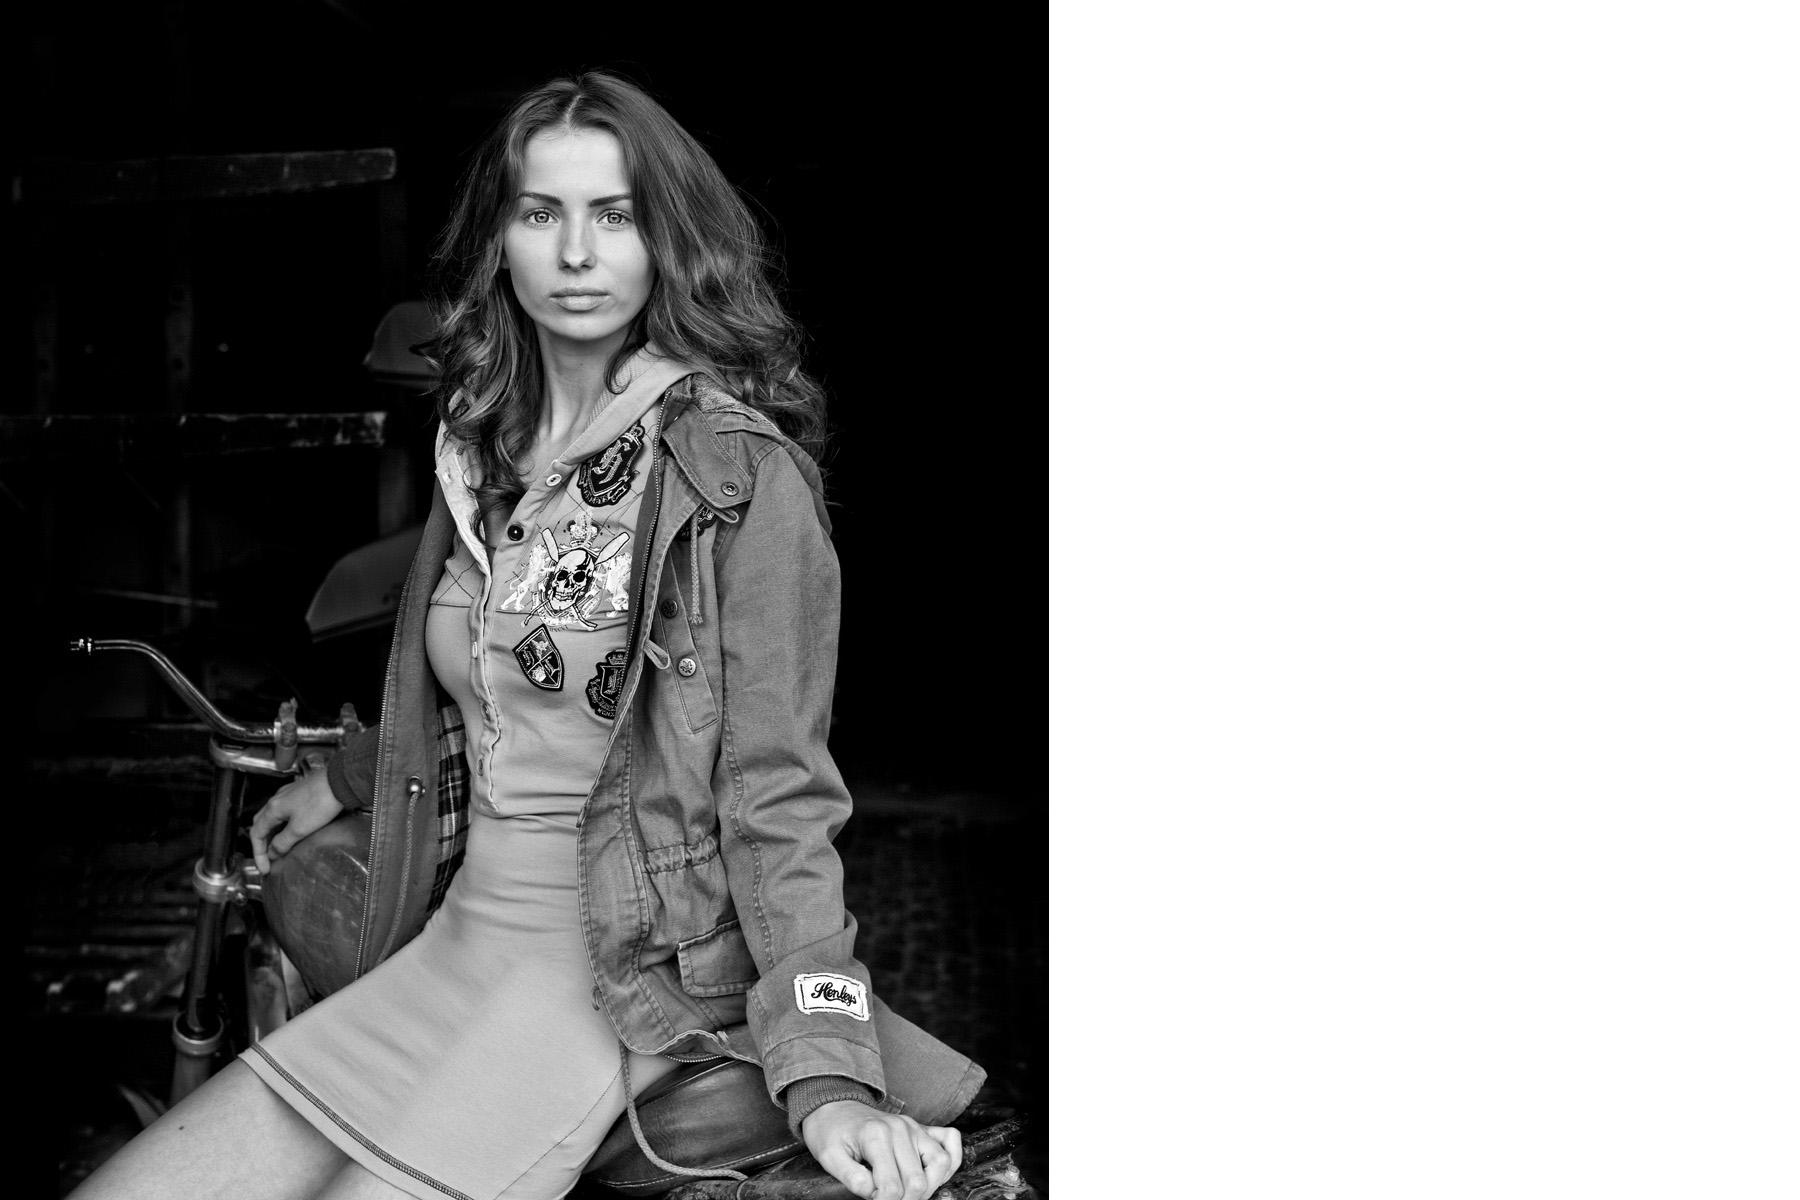 richard goulding fashion photographer_SQ_09.jpg